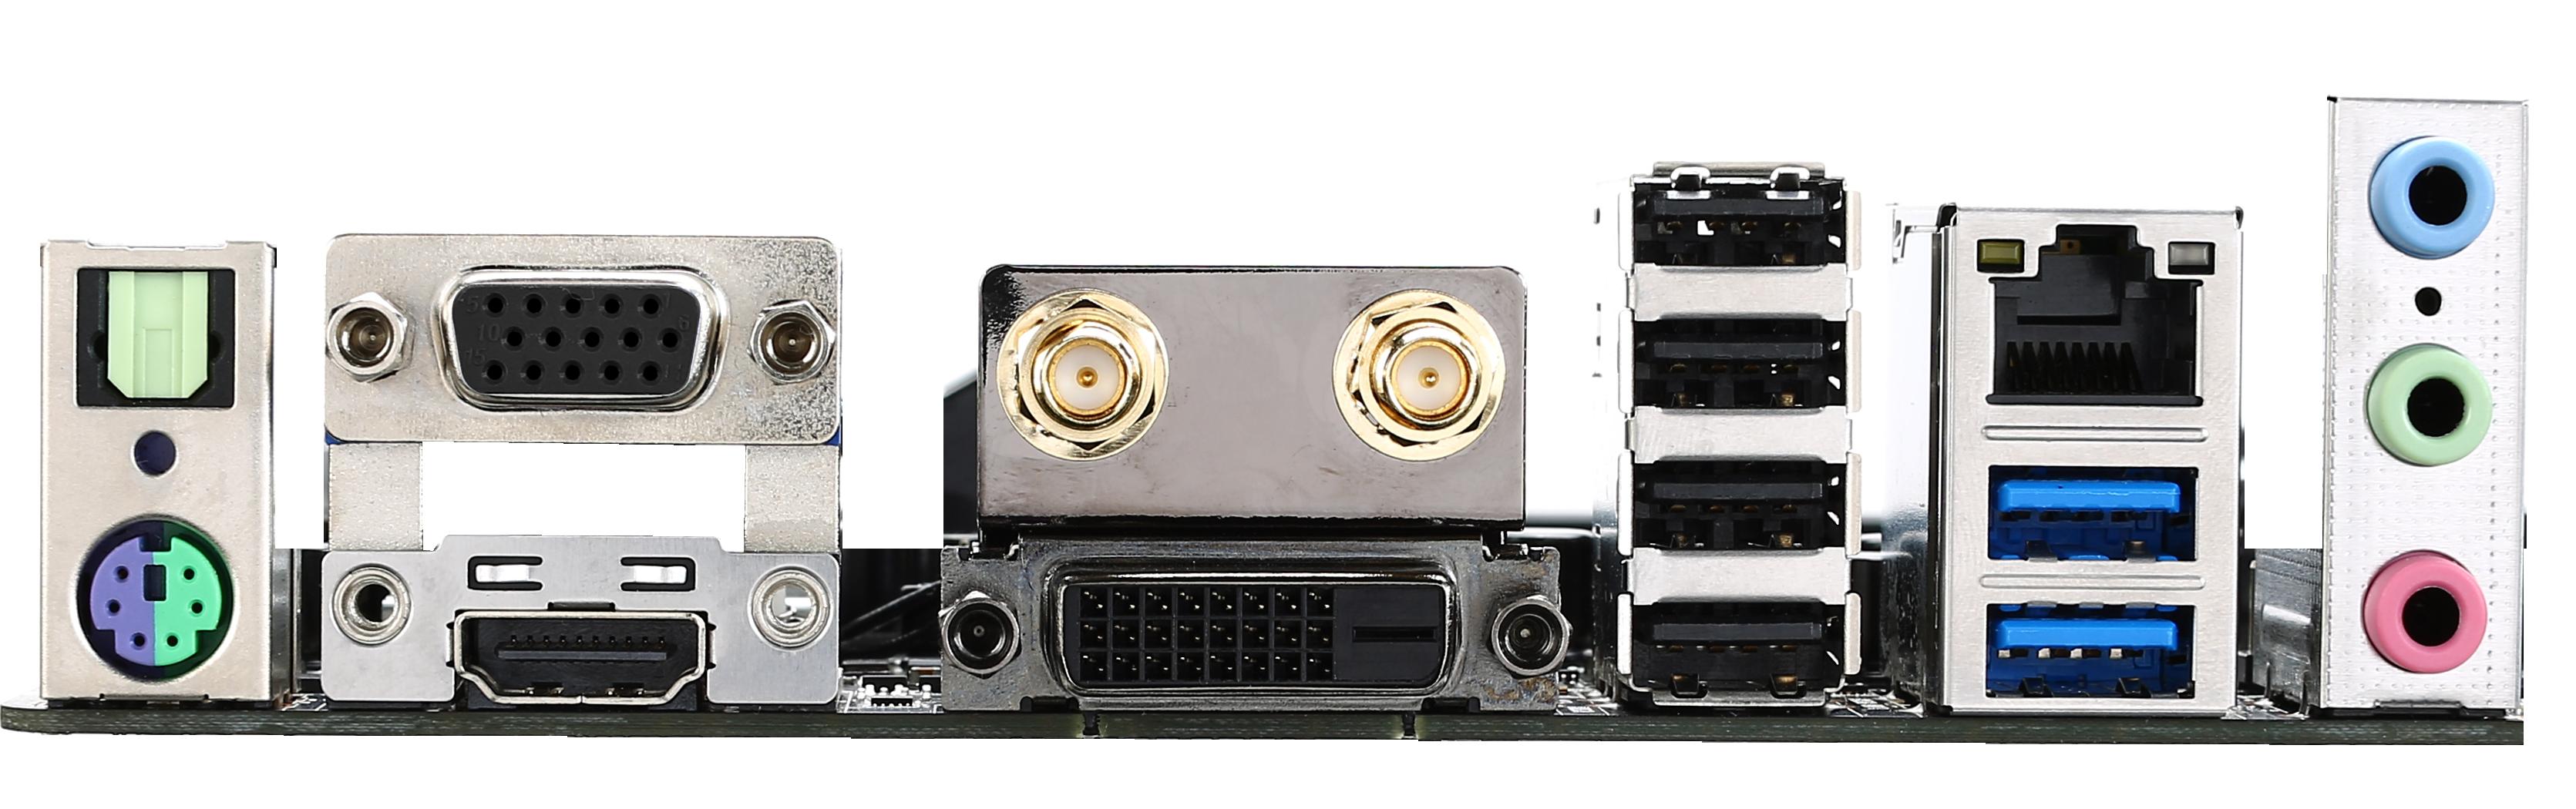 MSI Launches the A88XI AC, a mini-ITX FM2+ 802 11ac Motherboard